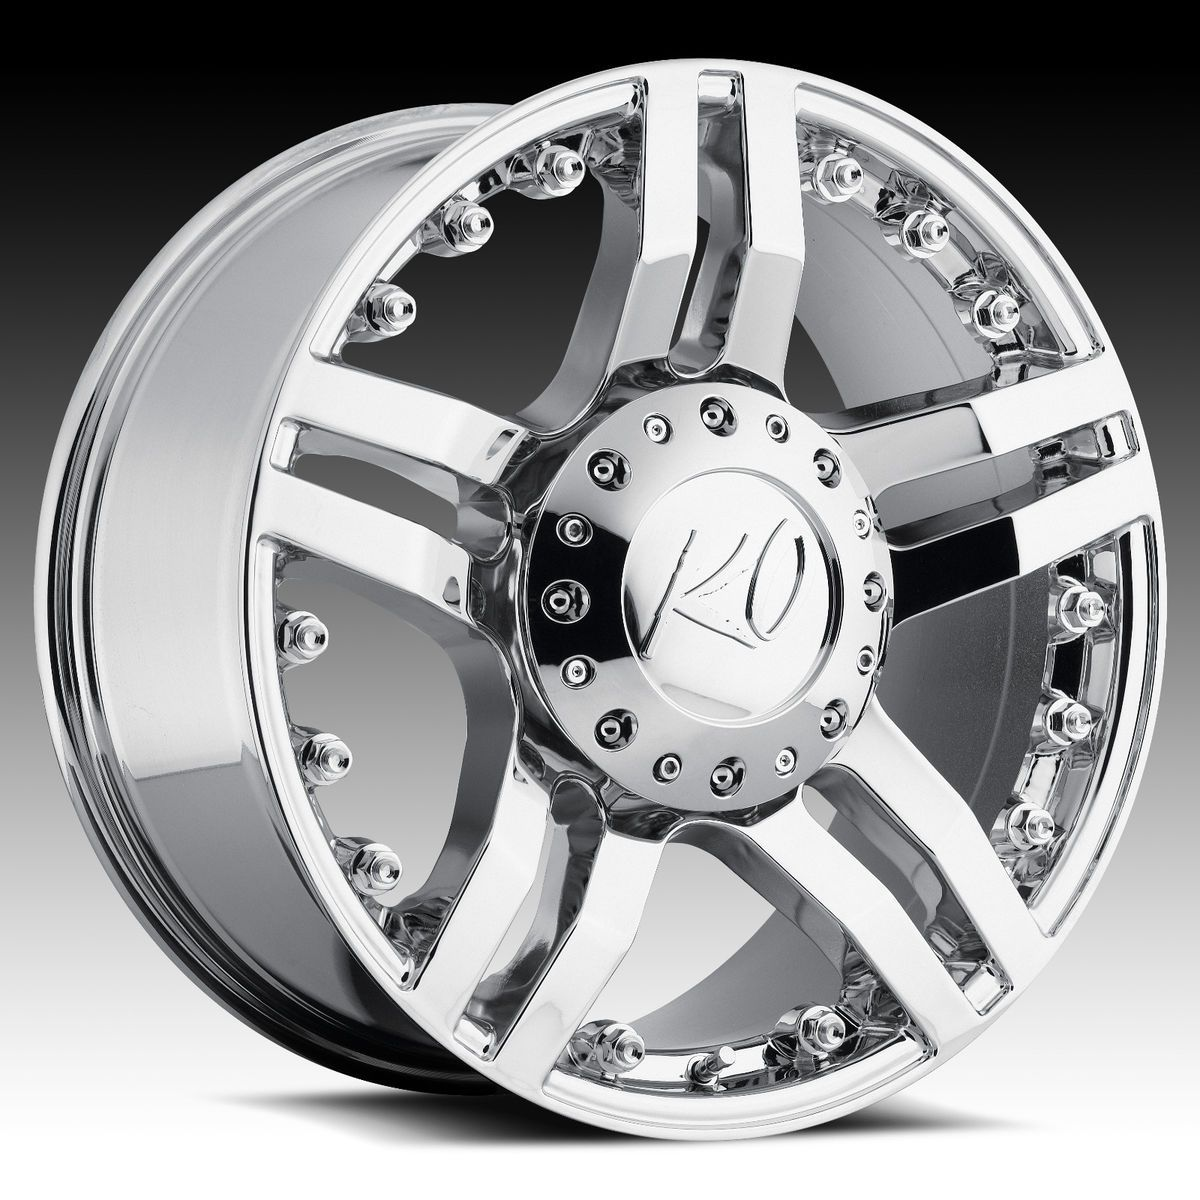 20 Chrome Rev Guillotine Wheels GMC Chevy Ford Truck SUV F 150